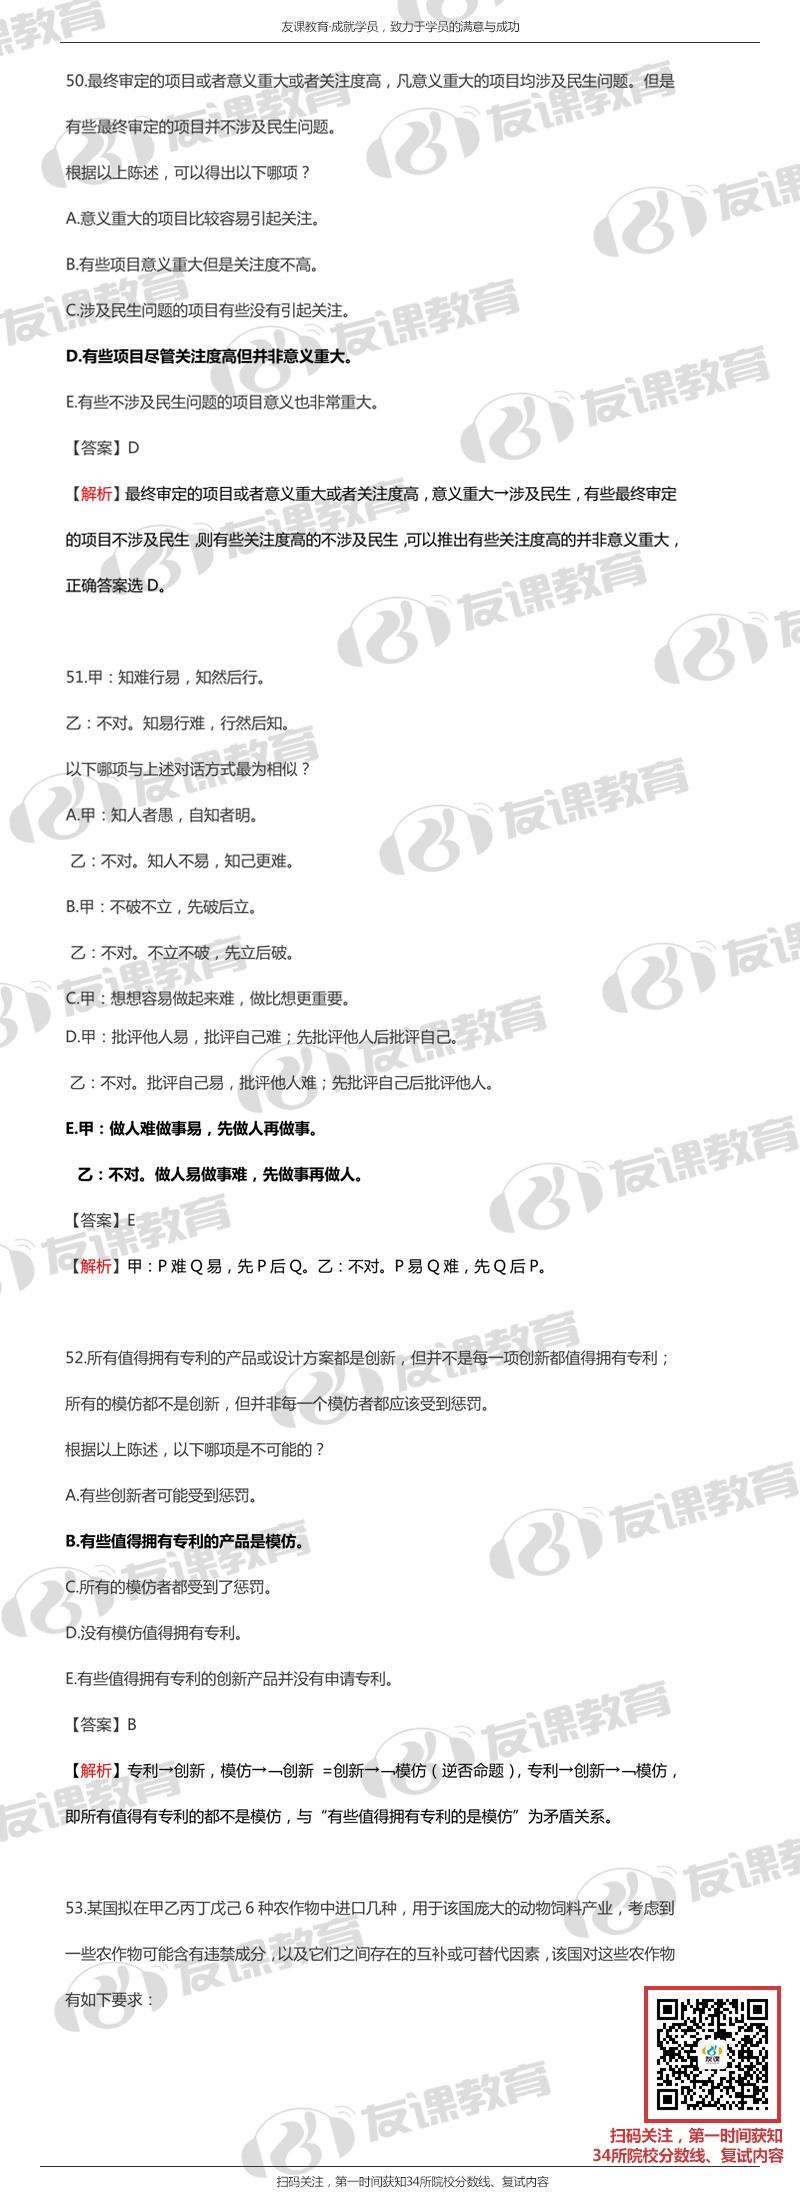 2018MBA聯考邏輯真題及解析10(友課教育版).jpg